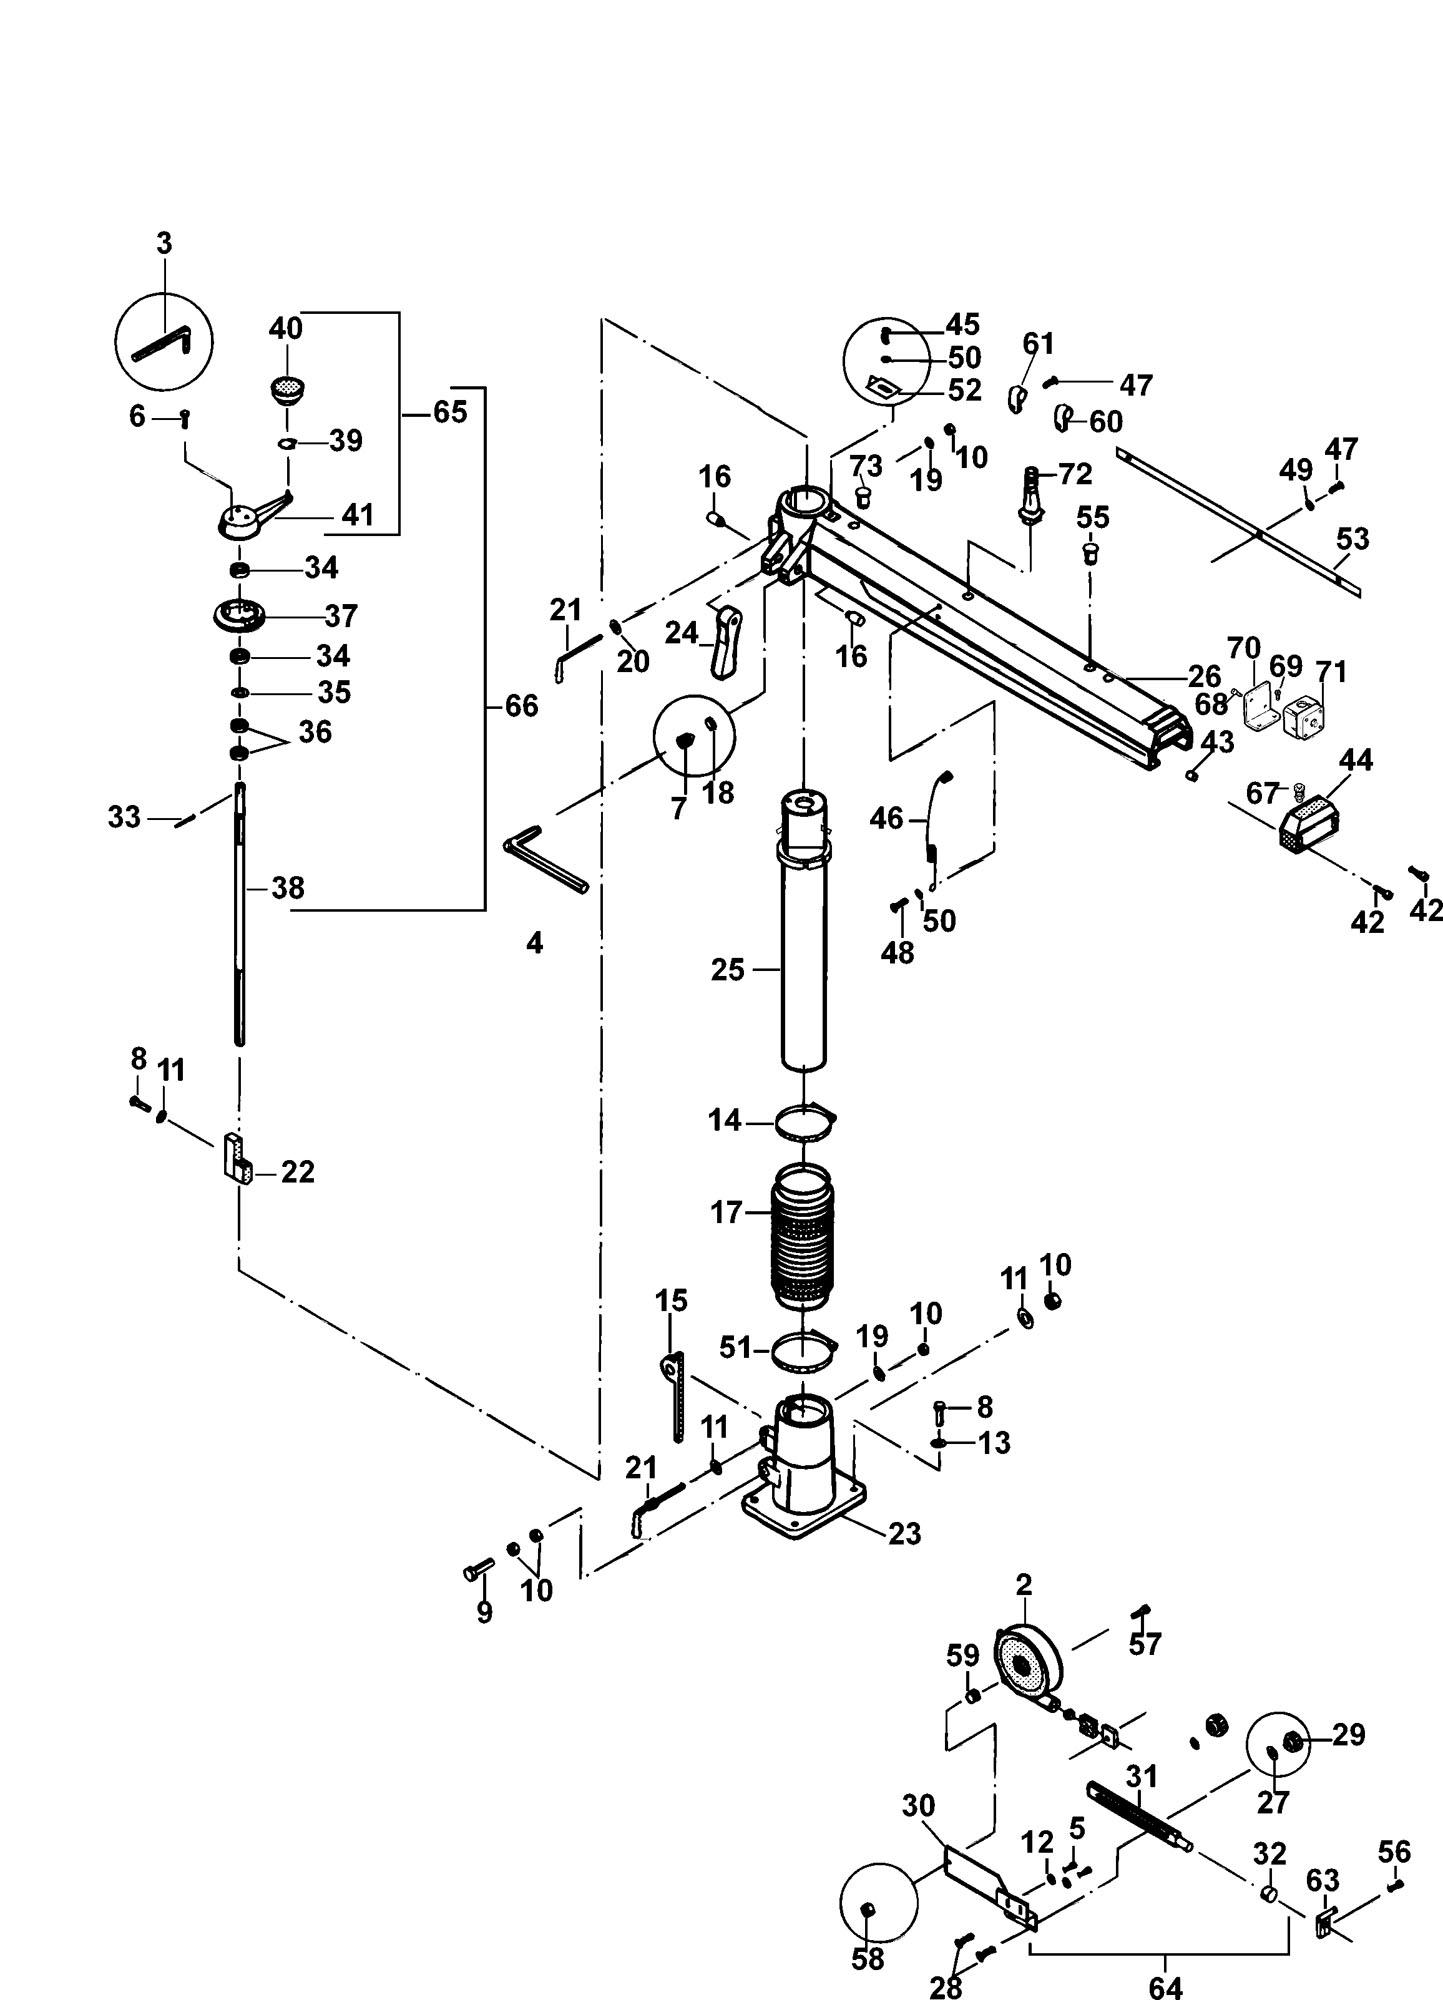 Radial Arm Saw Diagram